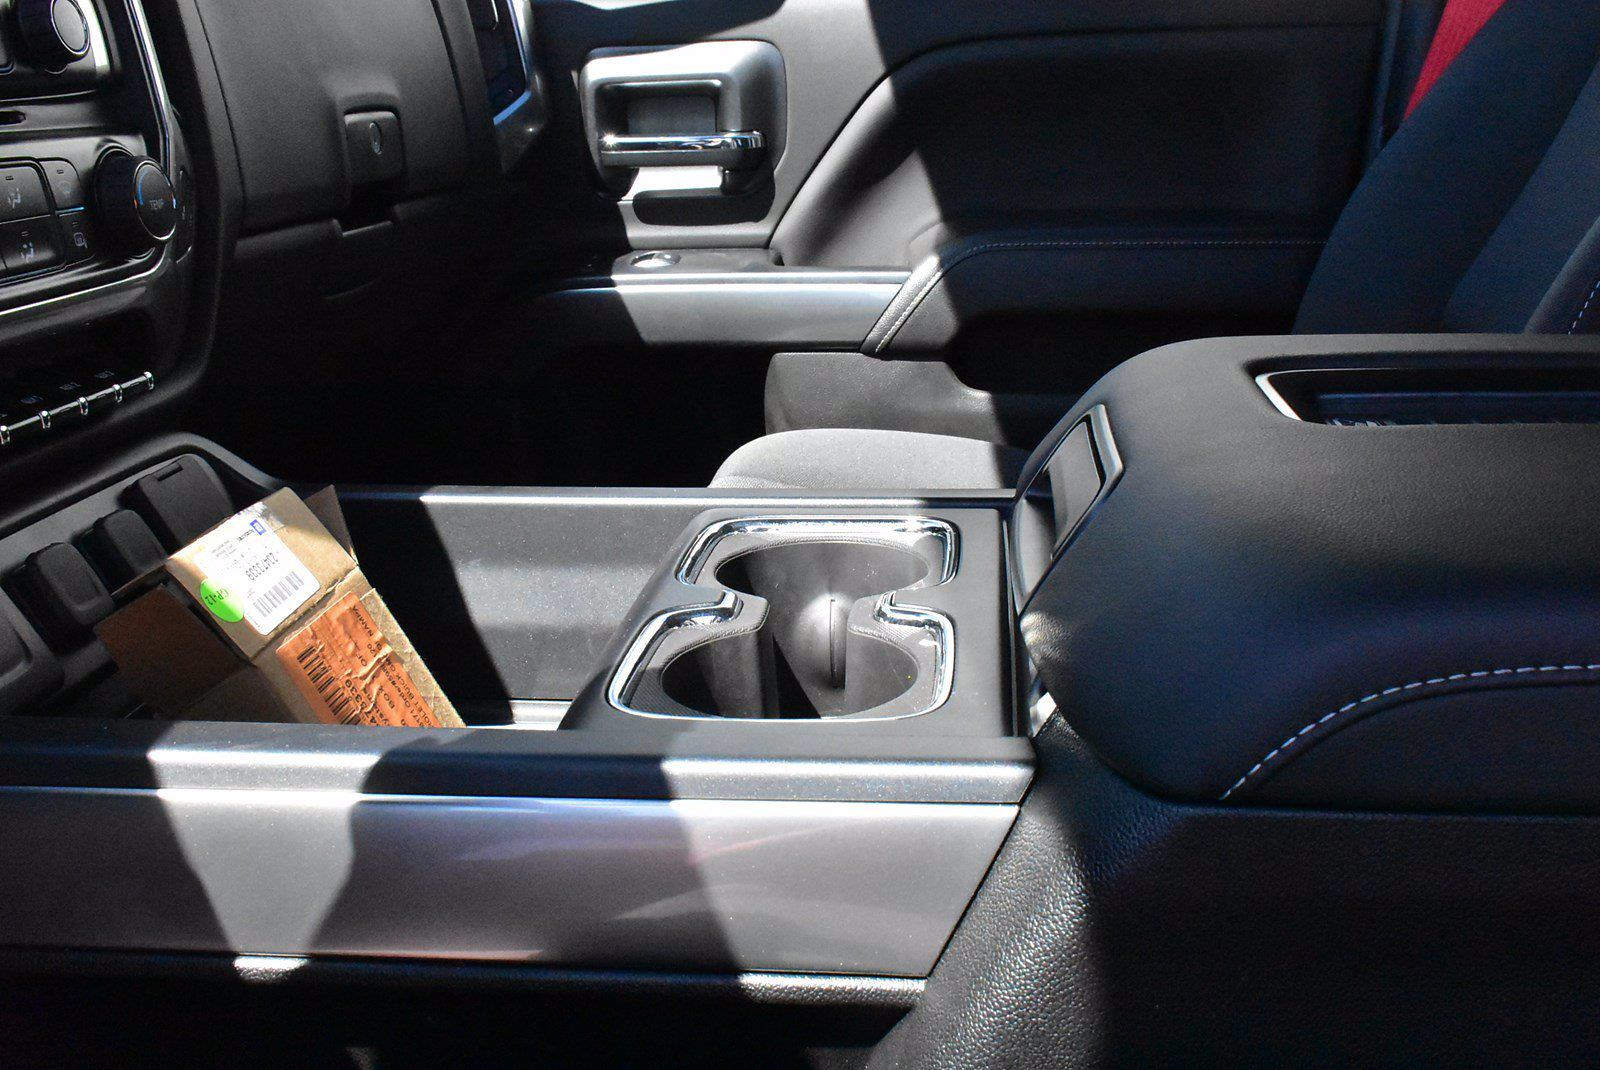 2020 Chevrolet Silverado 5500 DRW 4x2, Cab Chassis #D100225 - photo 5